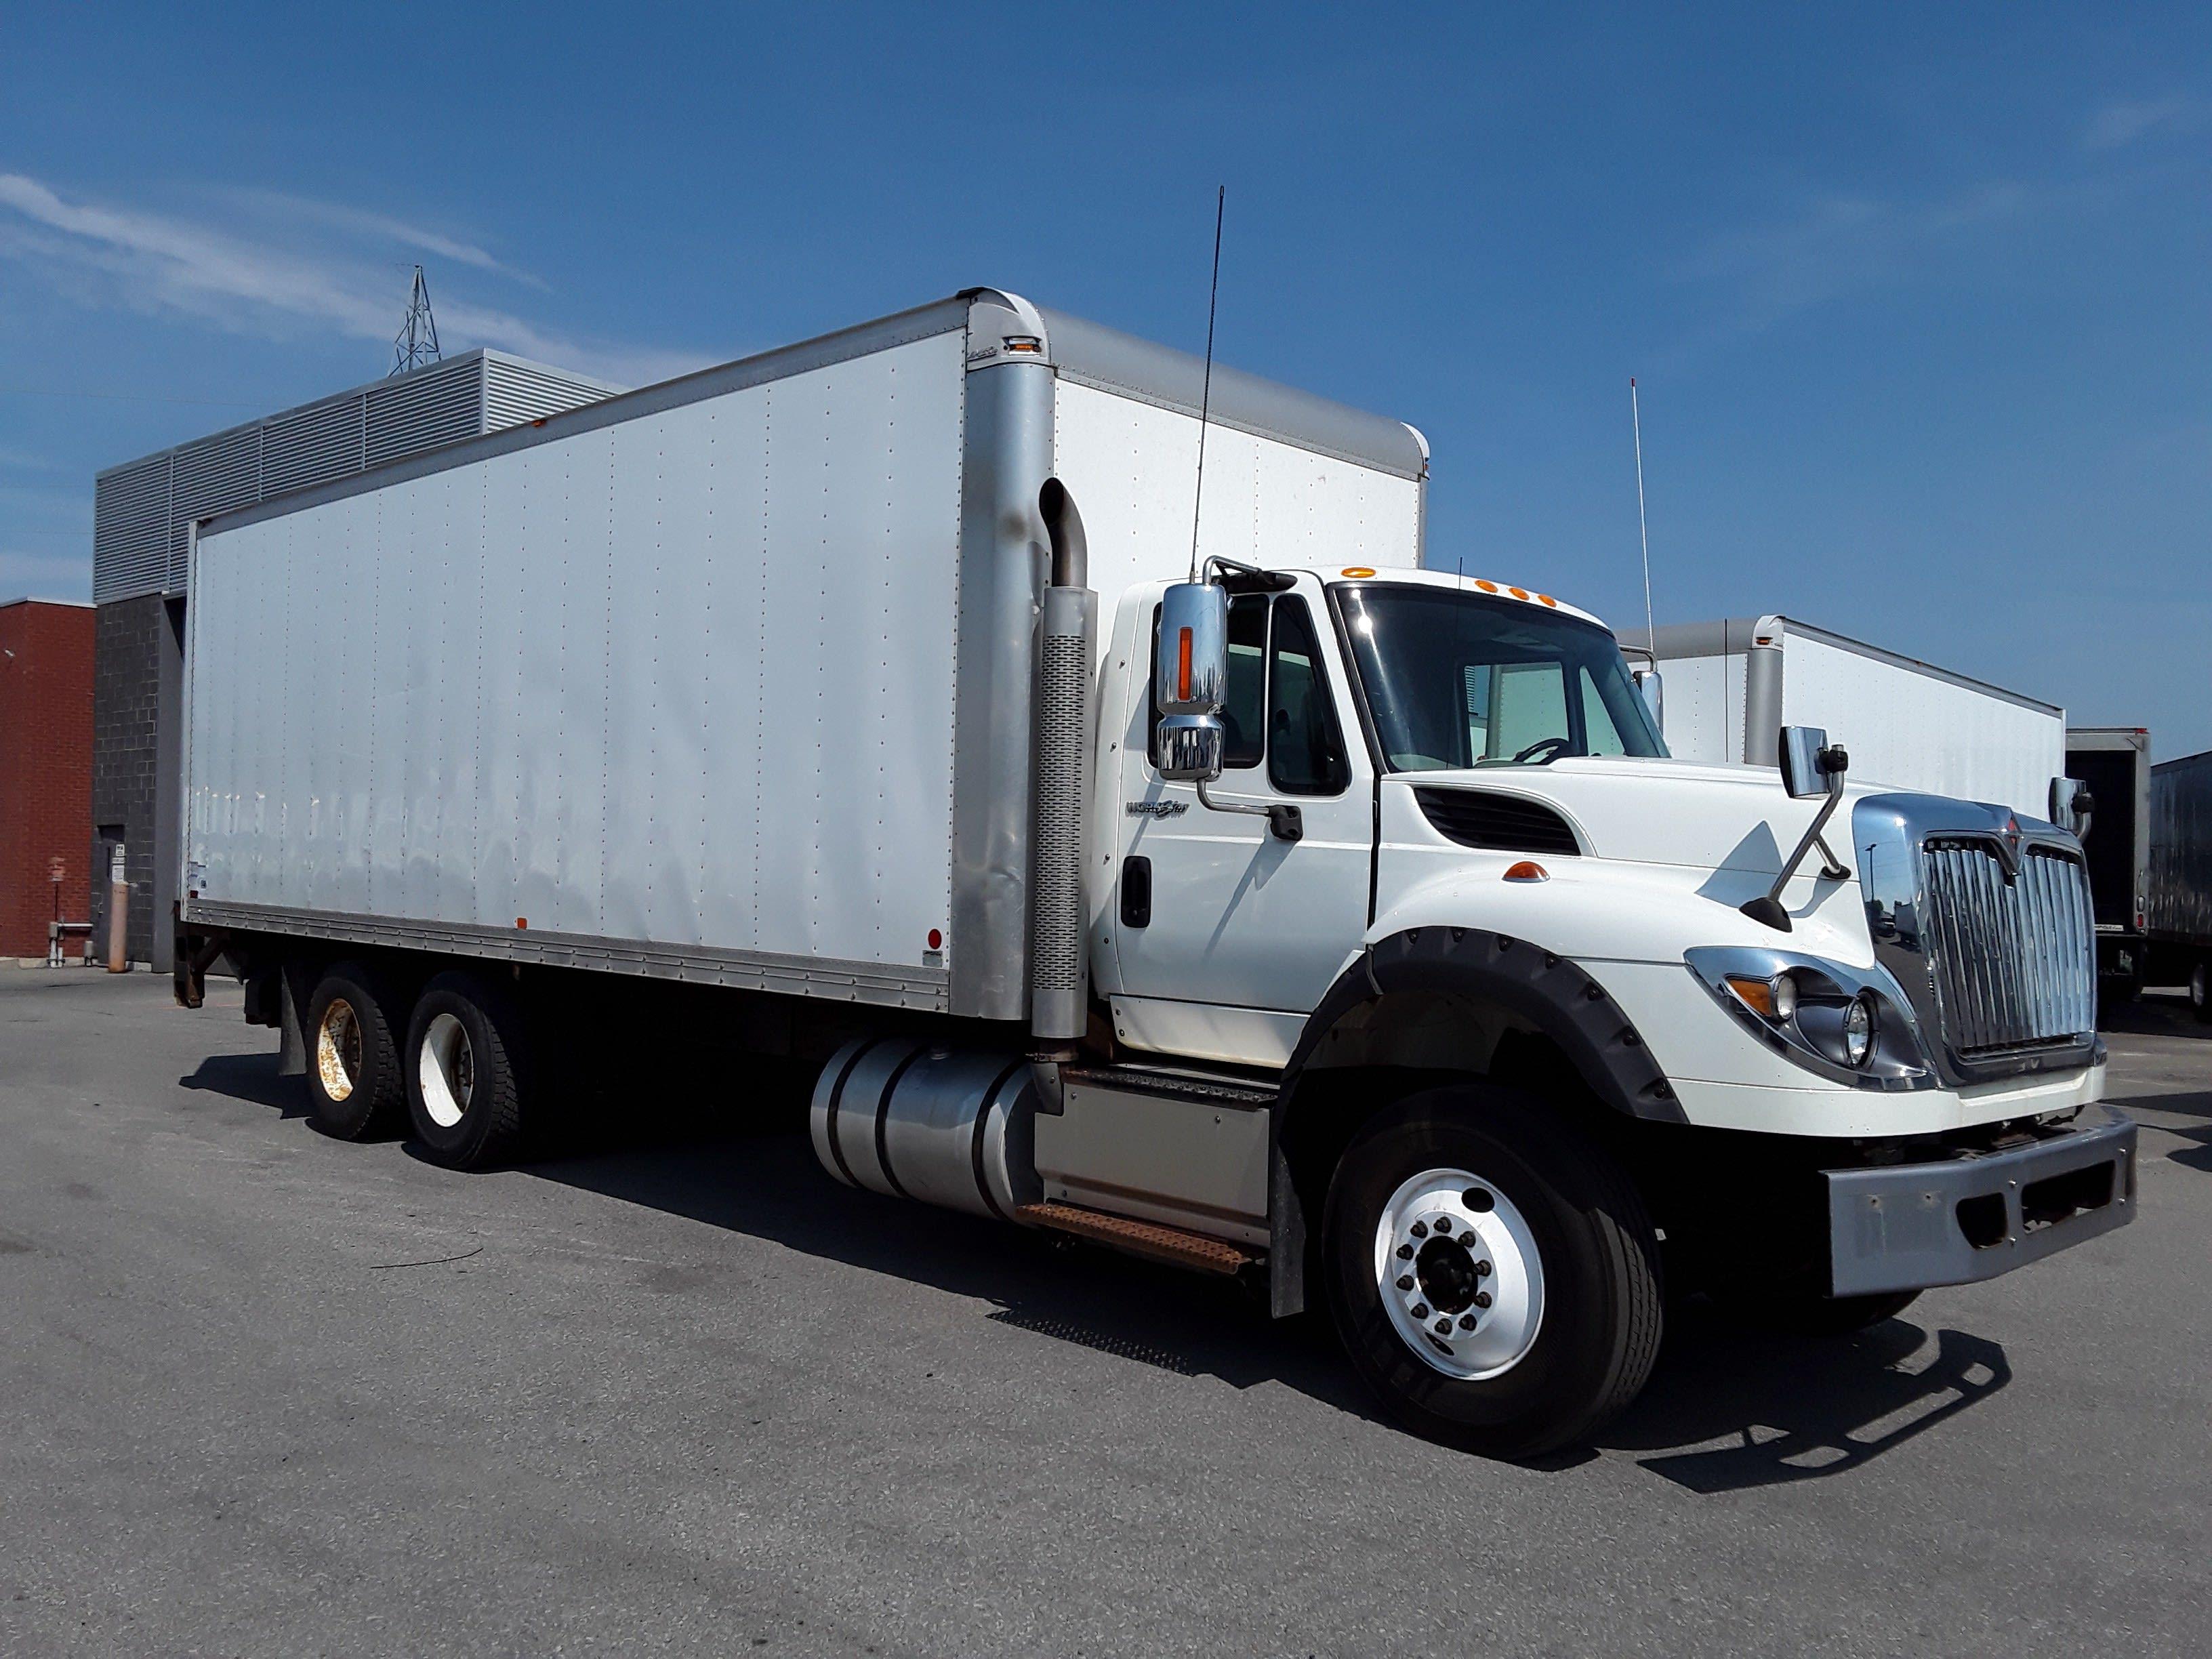 Ryder Used Truck for Sale – Navistar International, 7600